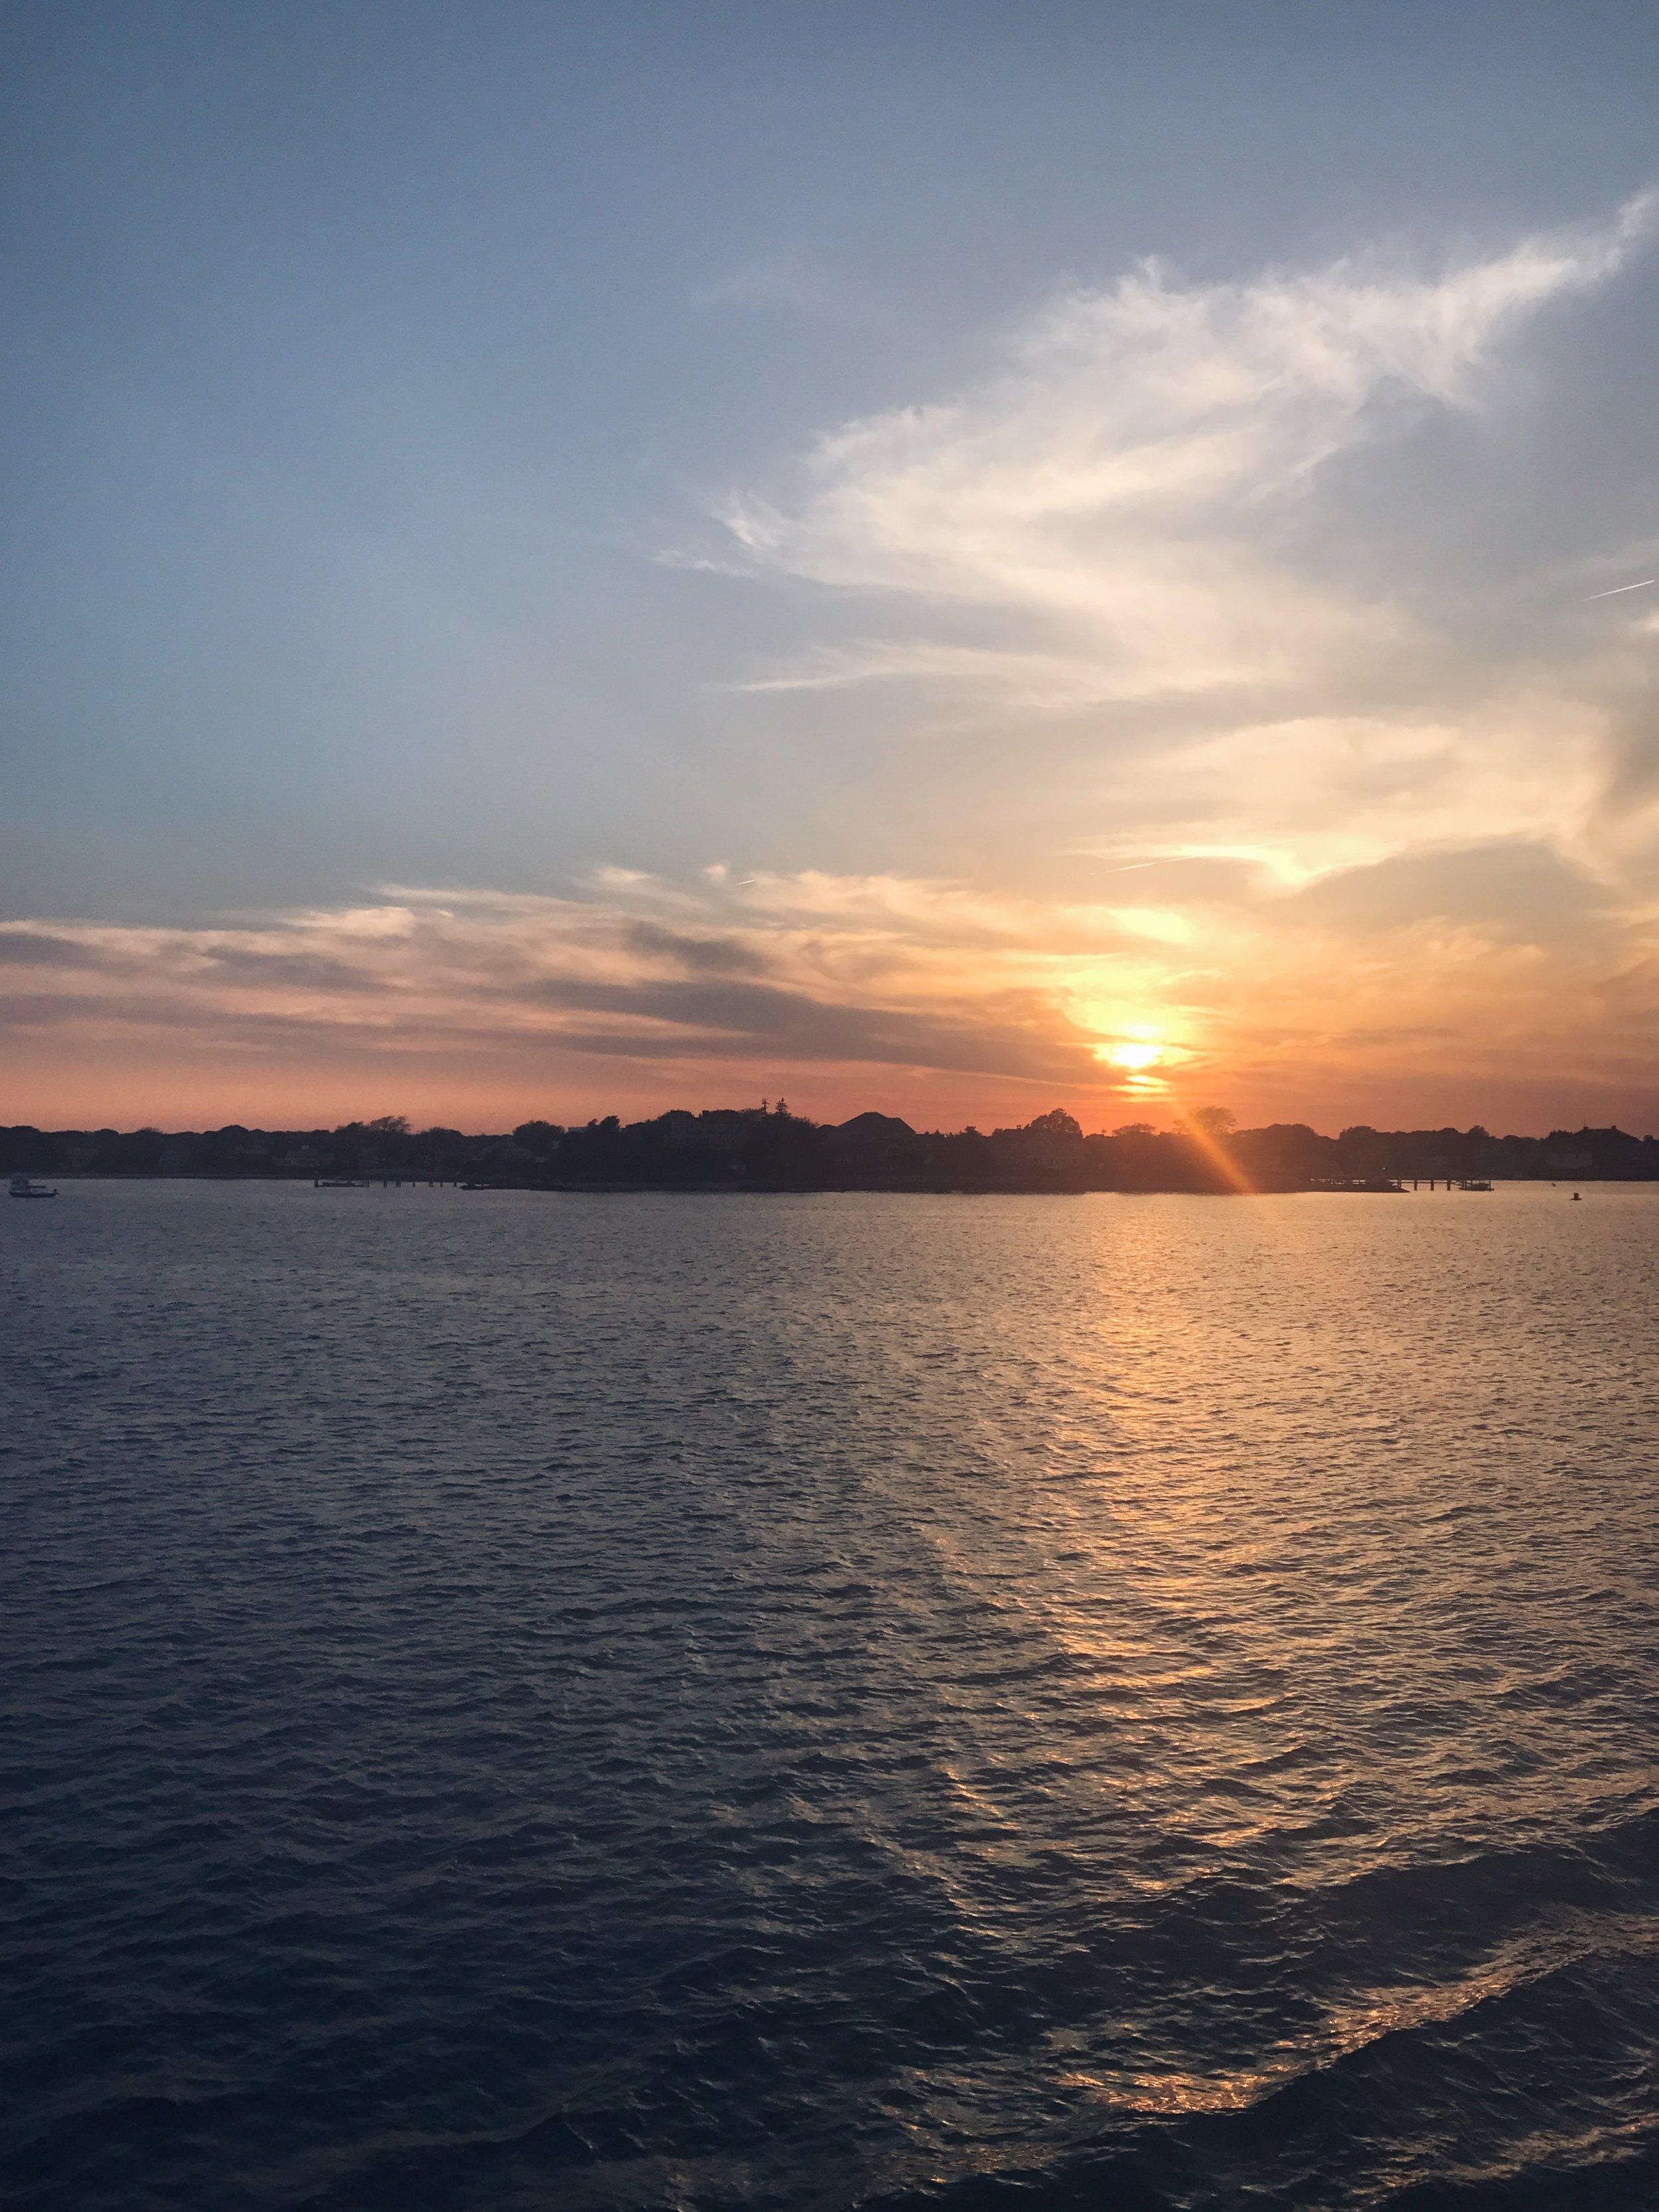 sunset / nantucket travel diary